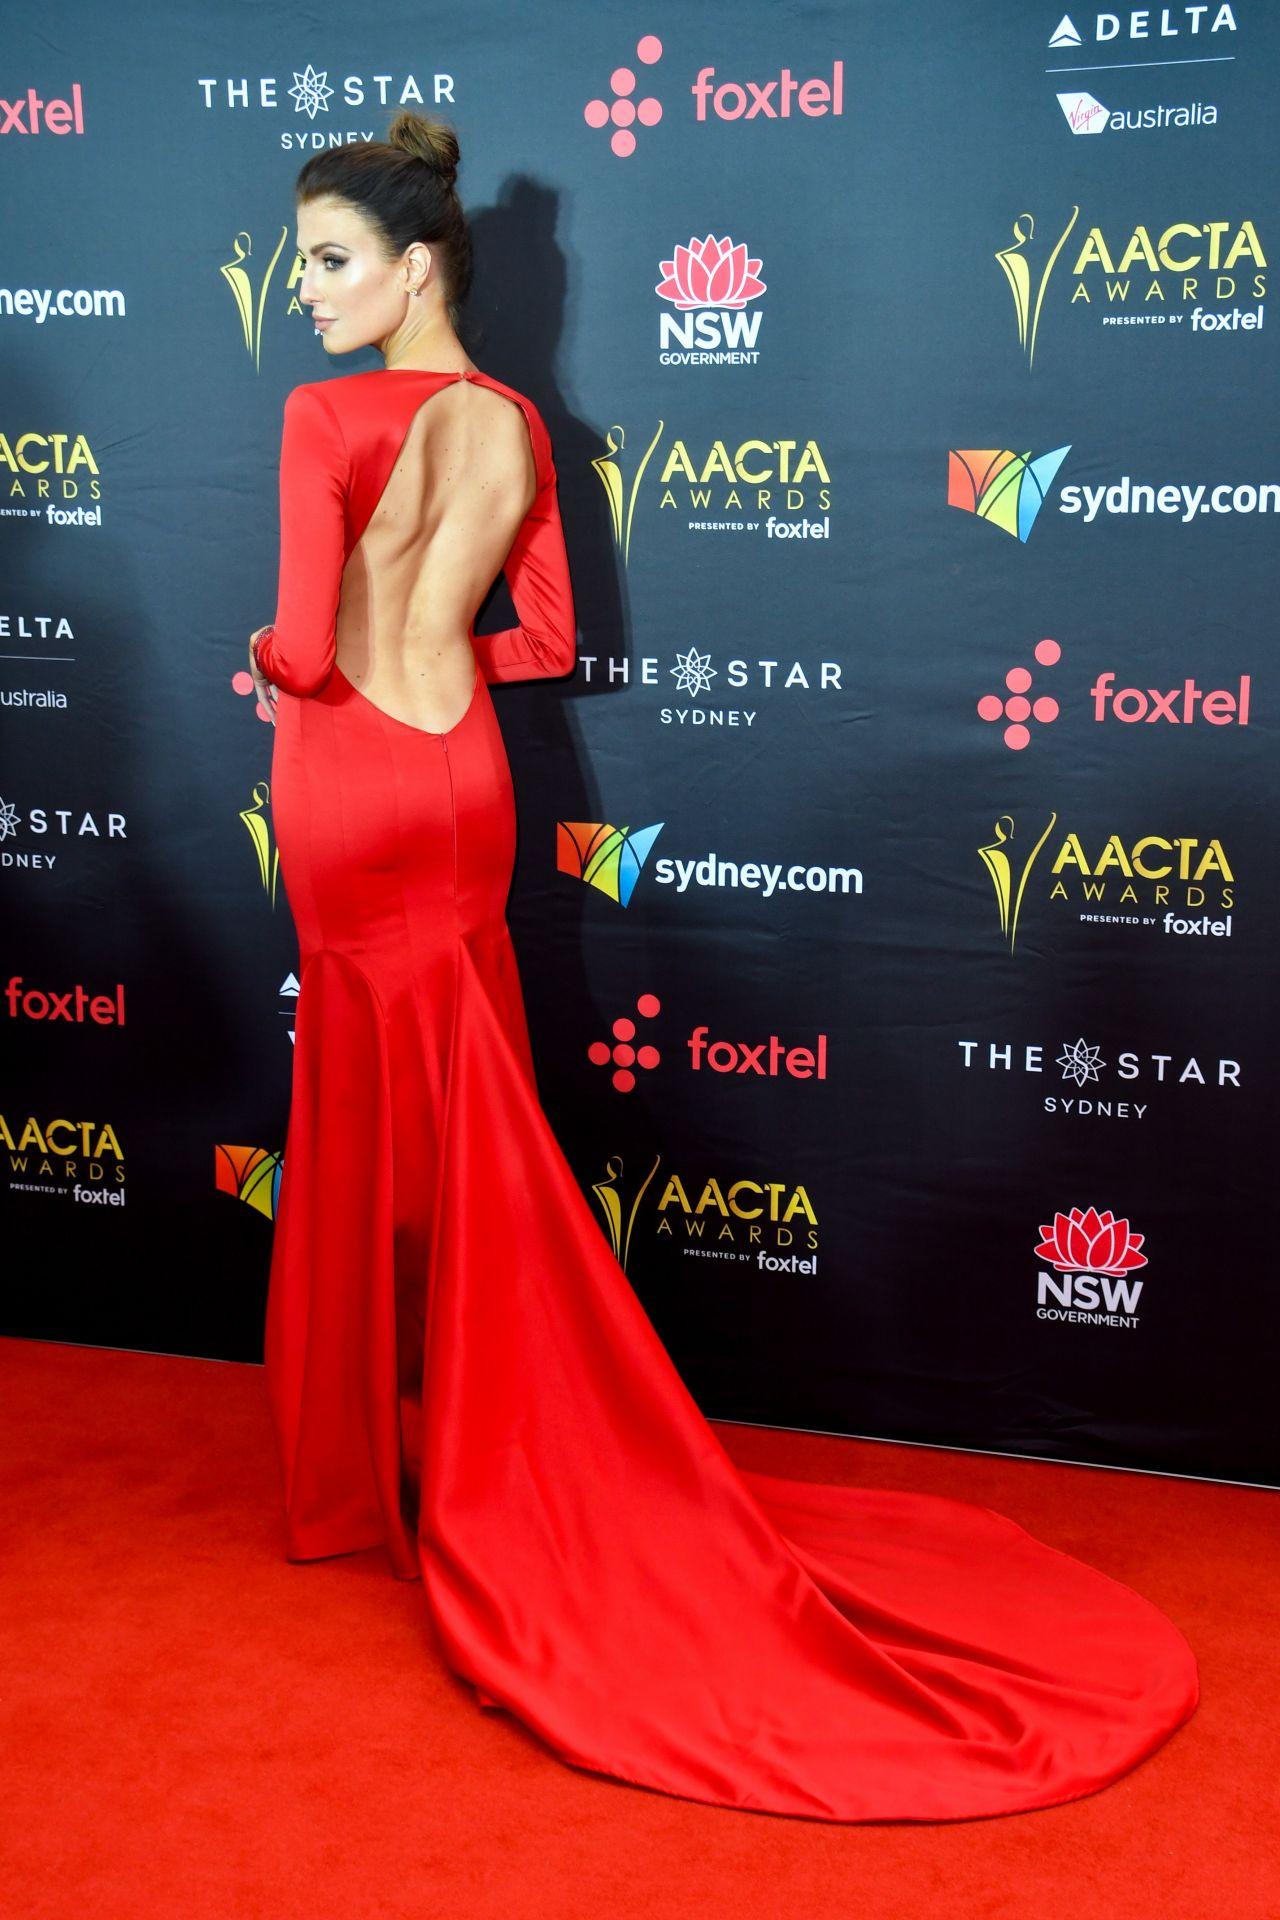 aacta awards - photo #40